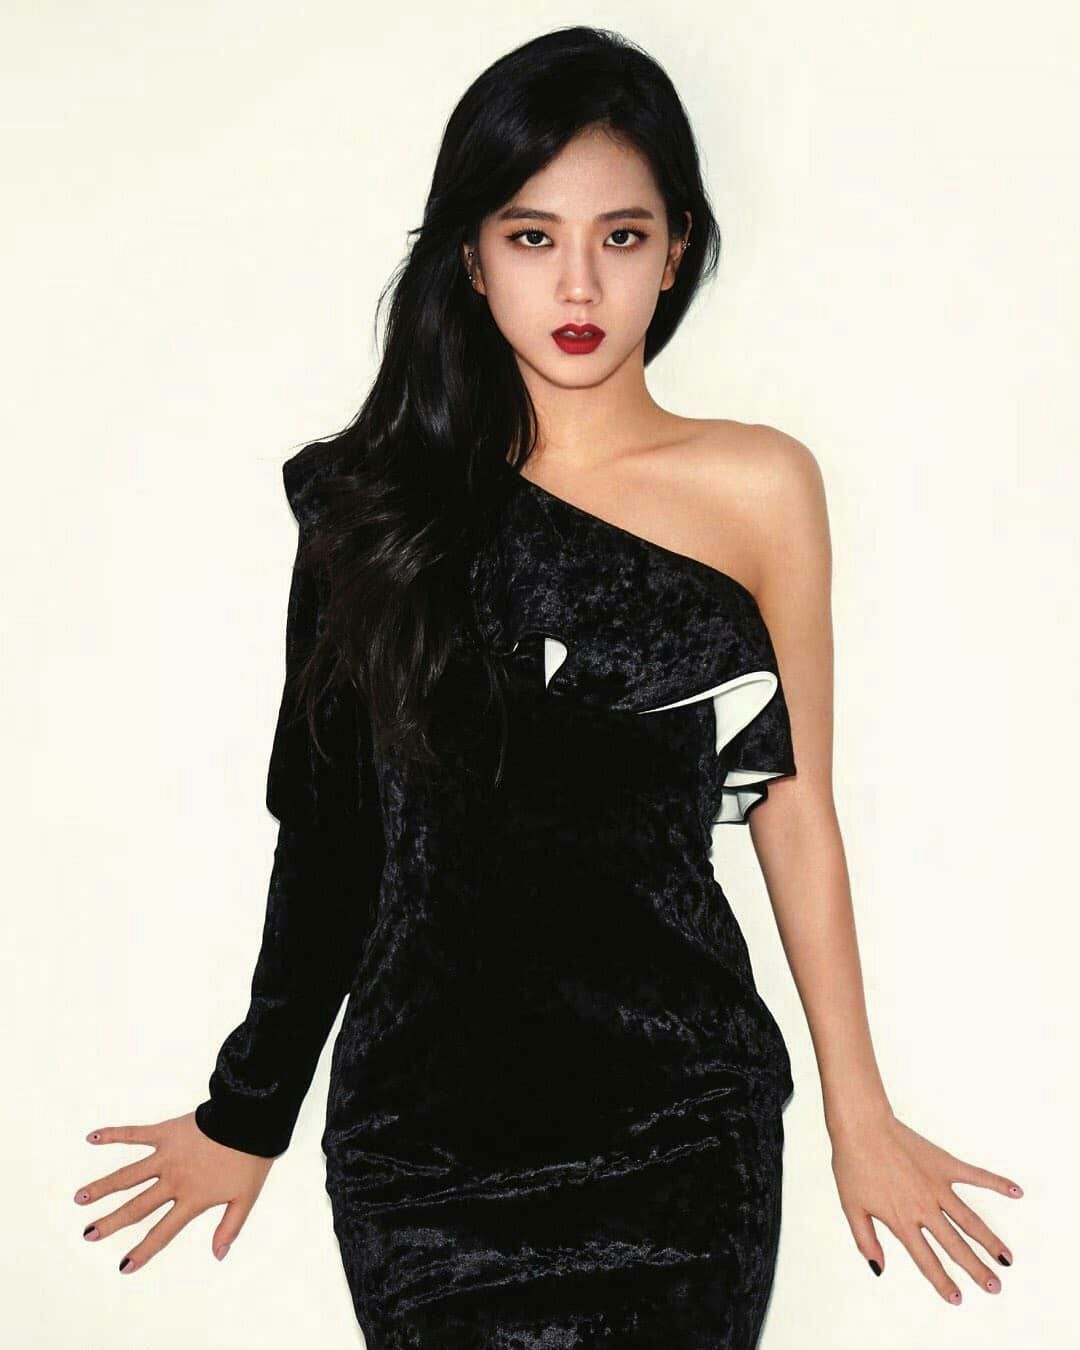 صور عضوات بلاك بينك Blackpink Fashion Blackpink Jisoo Fashion